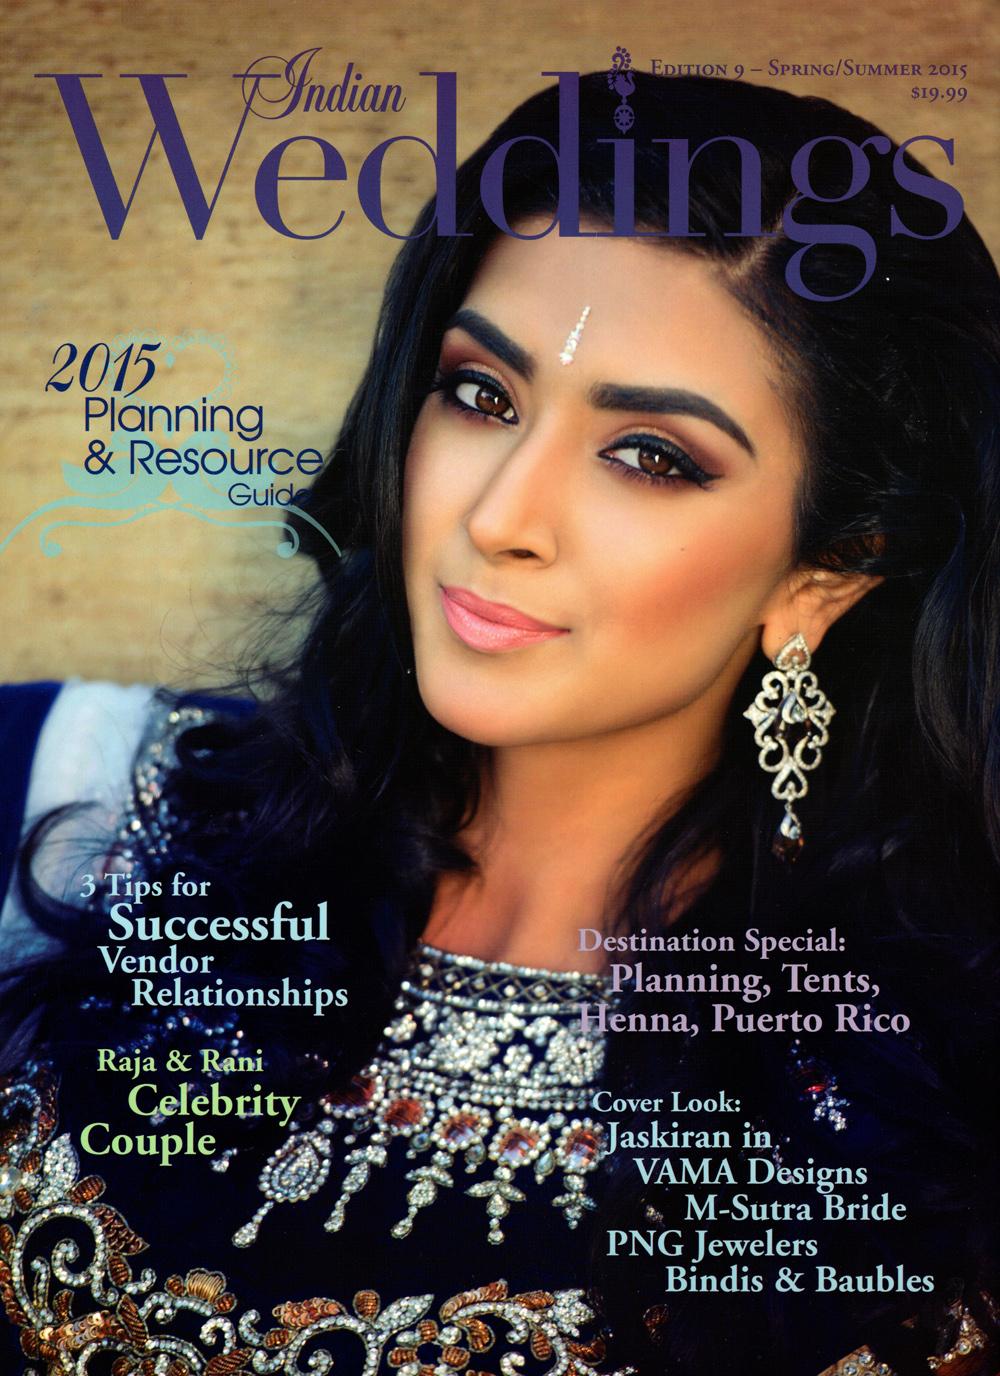 Raj Tents Destination Weddings Indian Wedding Magazine